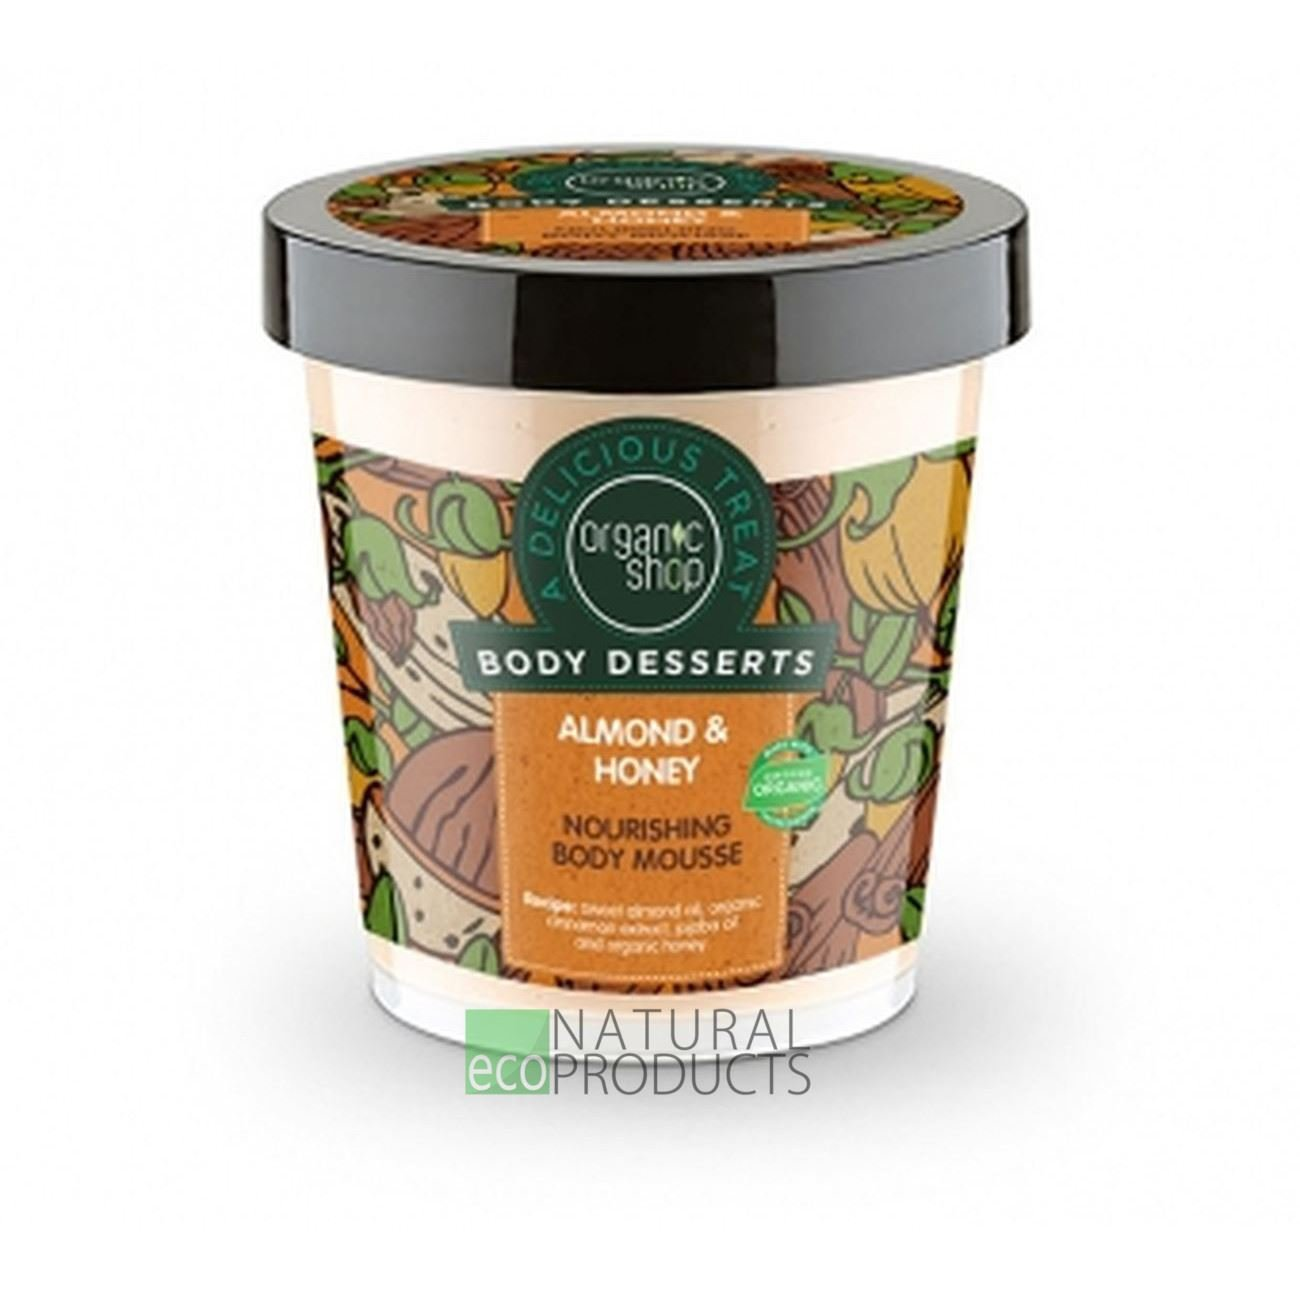 Organic Shop Body desserts Almond & Honey Nourishing Body Mousse 450ml by Organic Shop